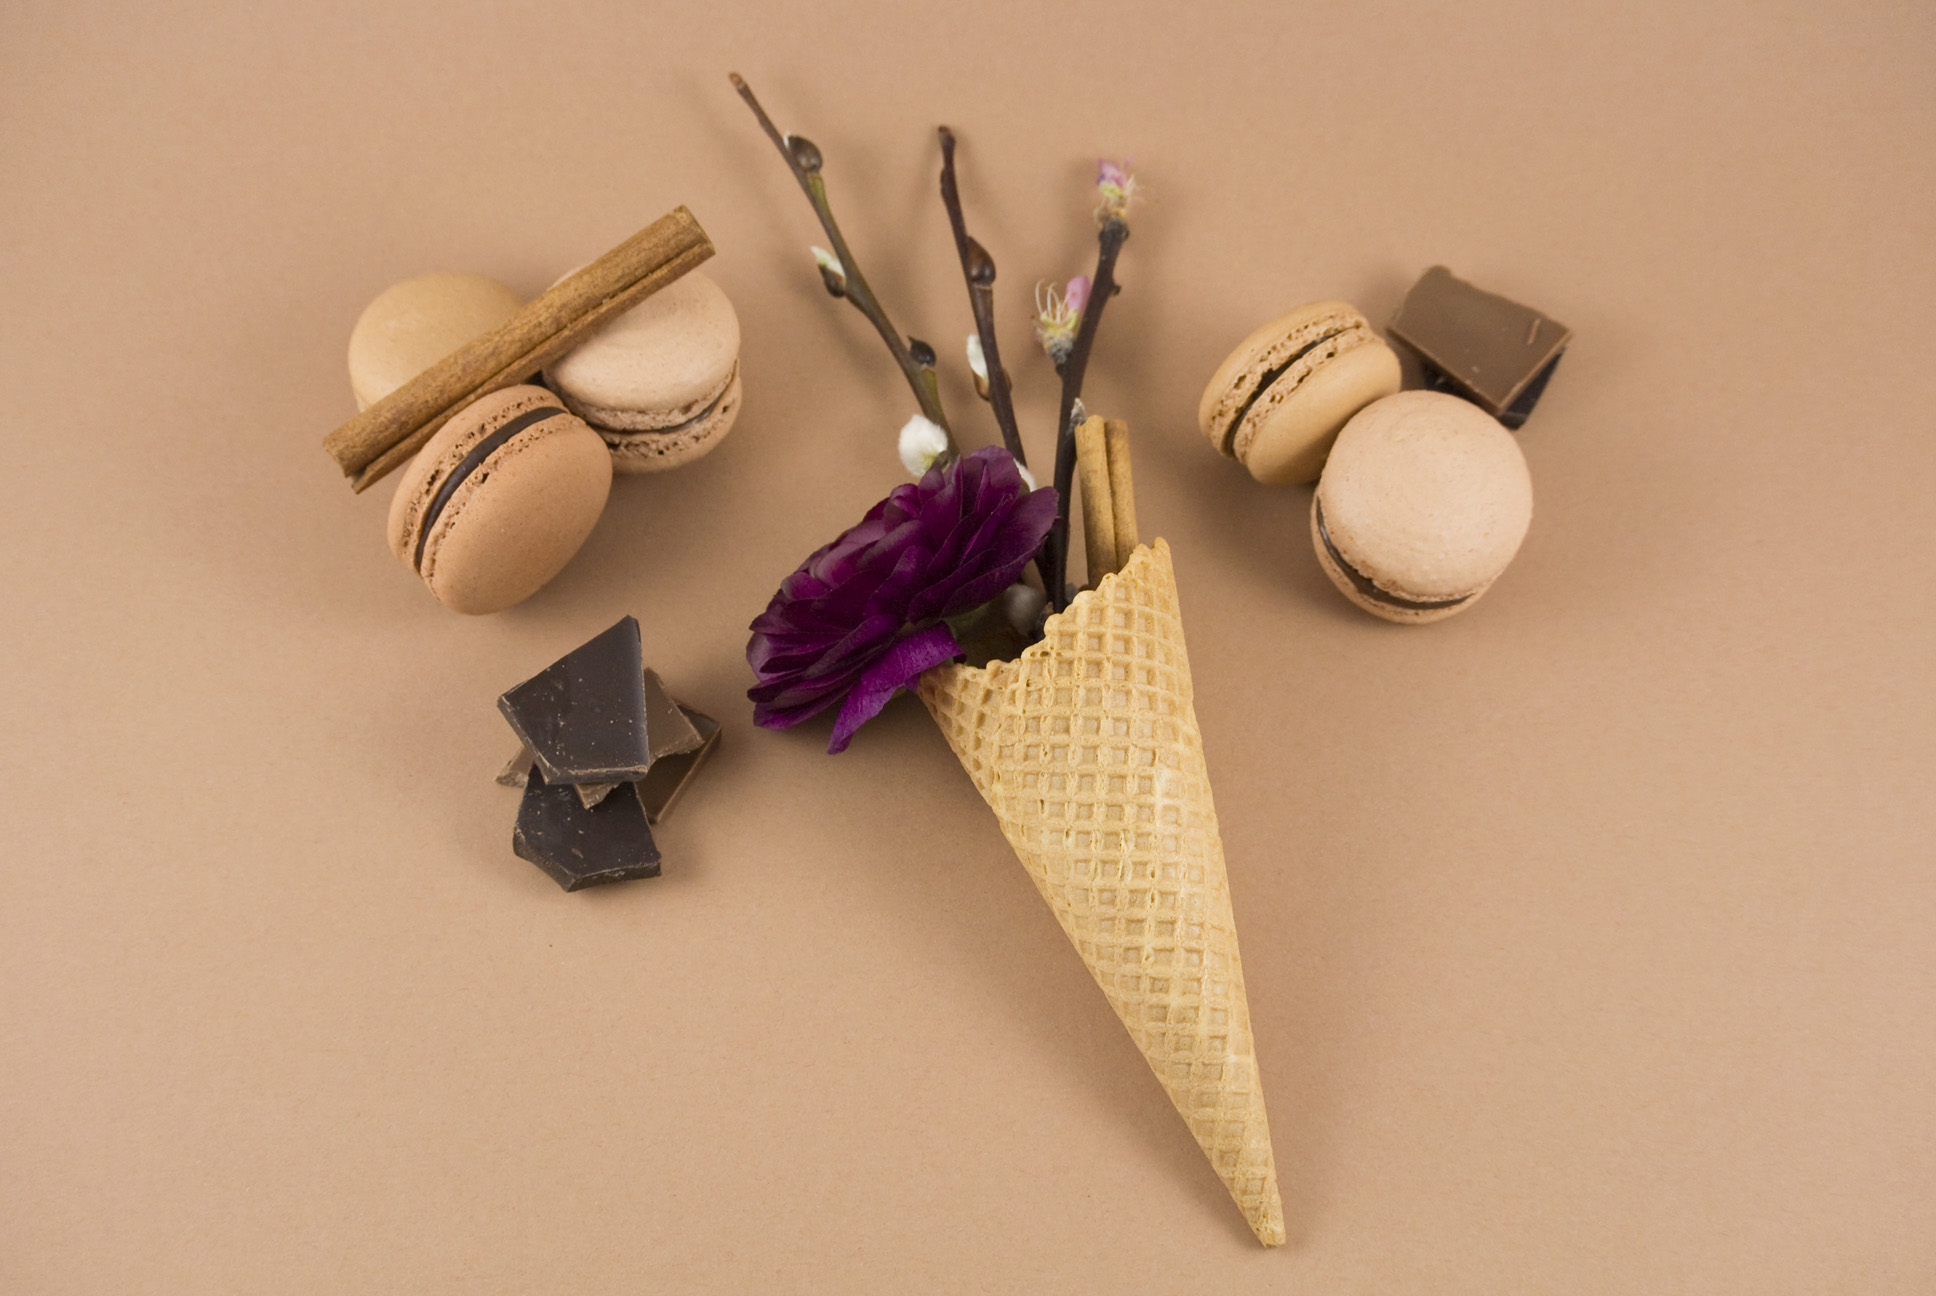 La petite Bellerose, Macaron Eis Chocolate